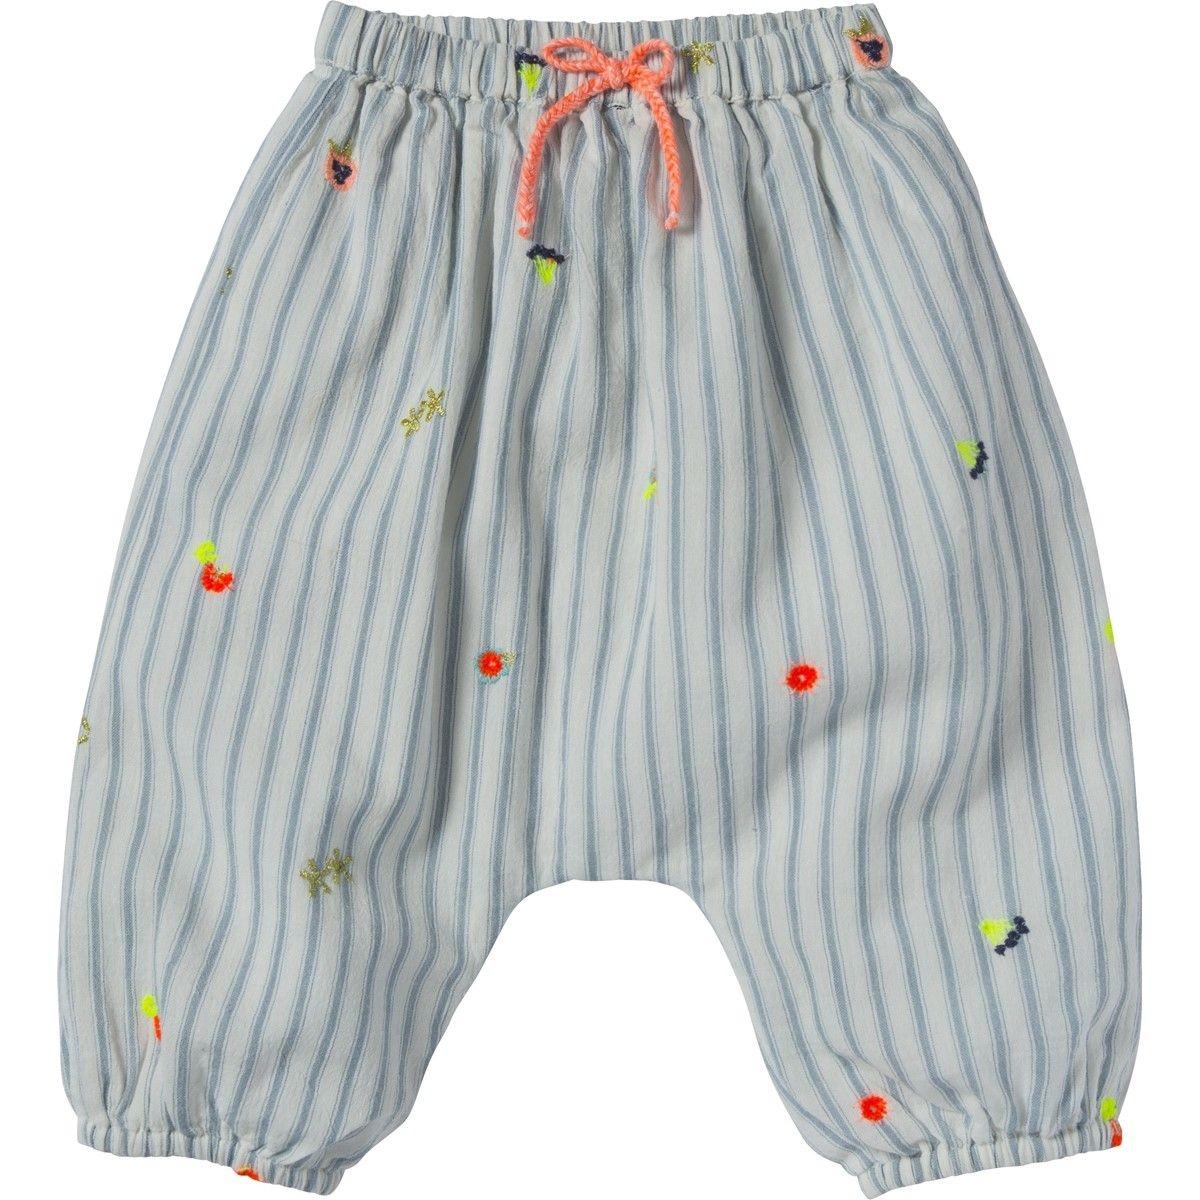 Pantalon rayé et brodé  Willy à fleurs